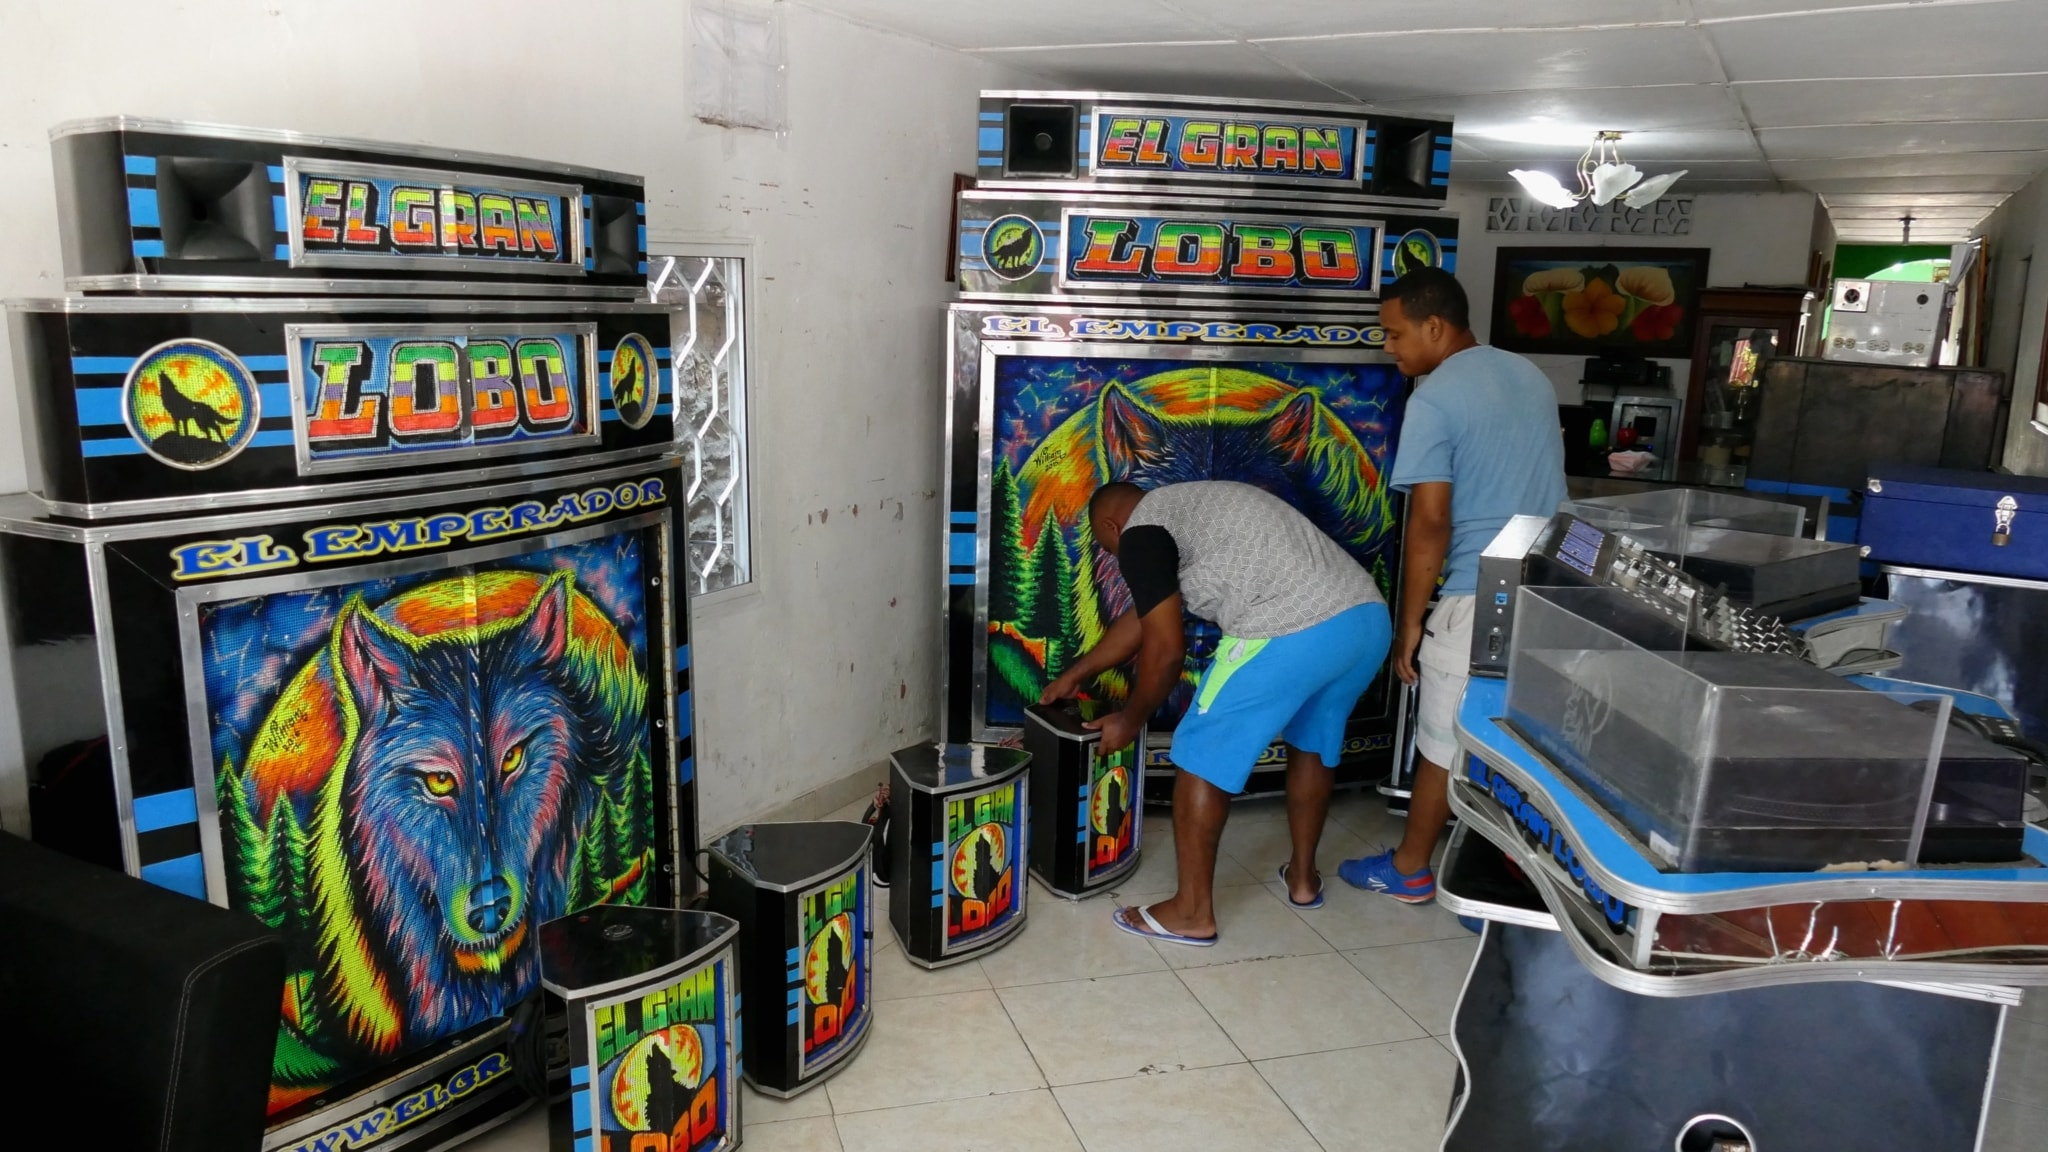 Karibiens mobila discon skapar nya danser